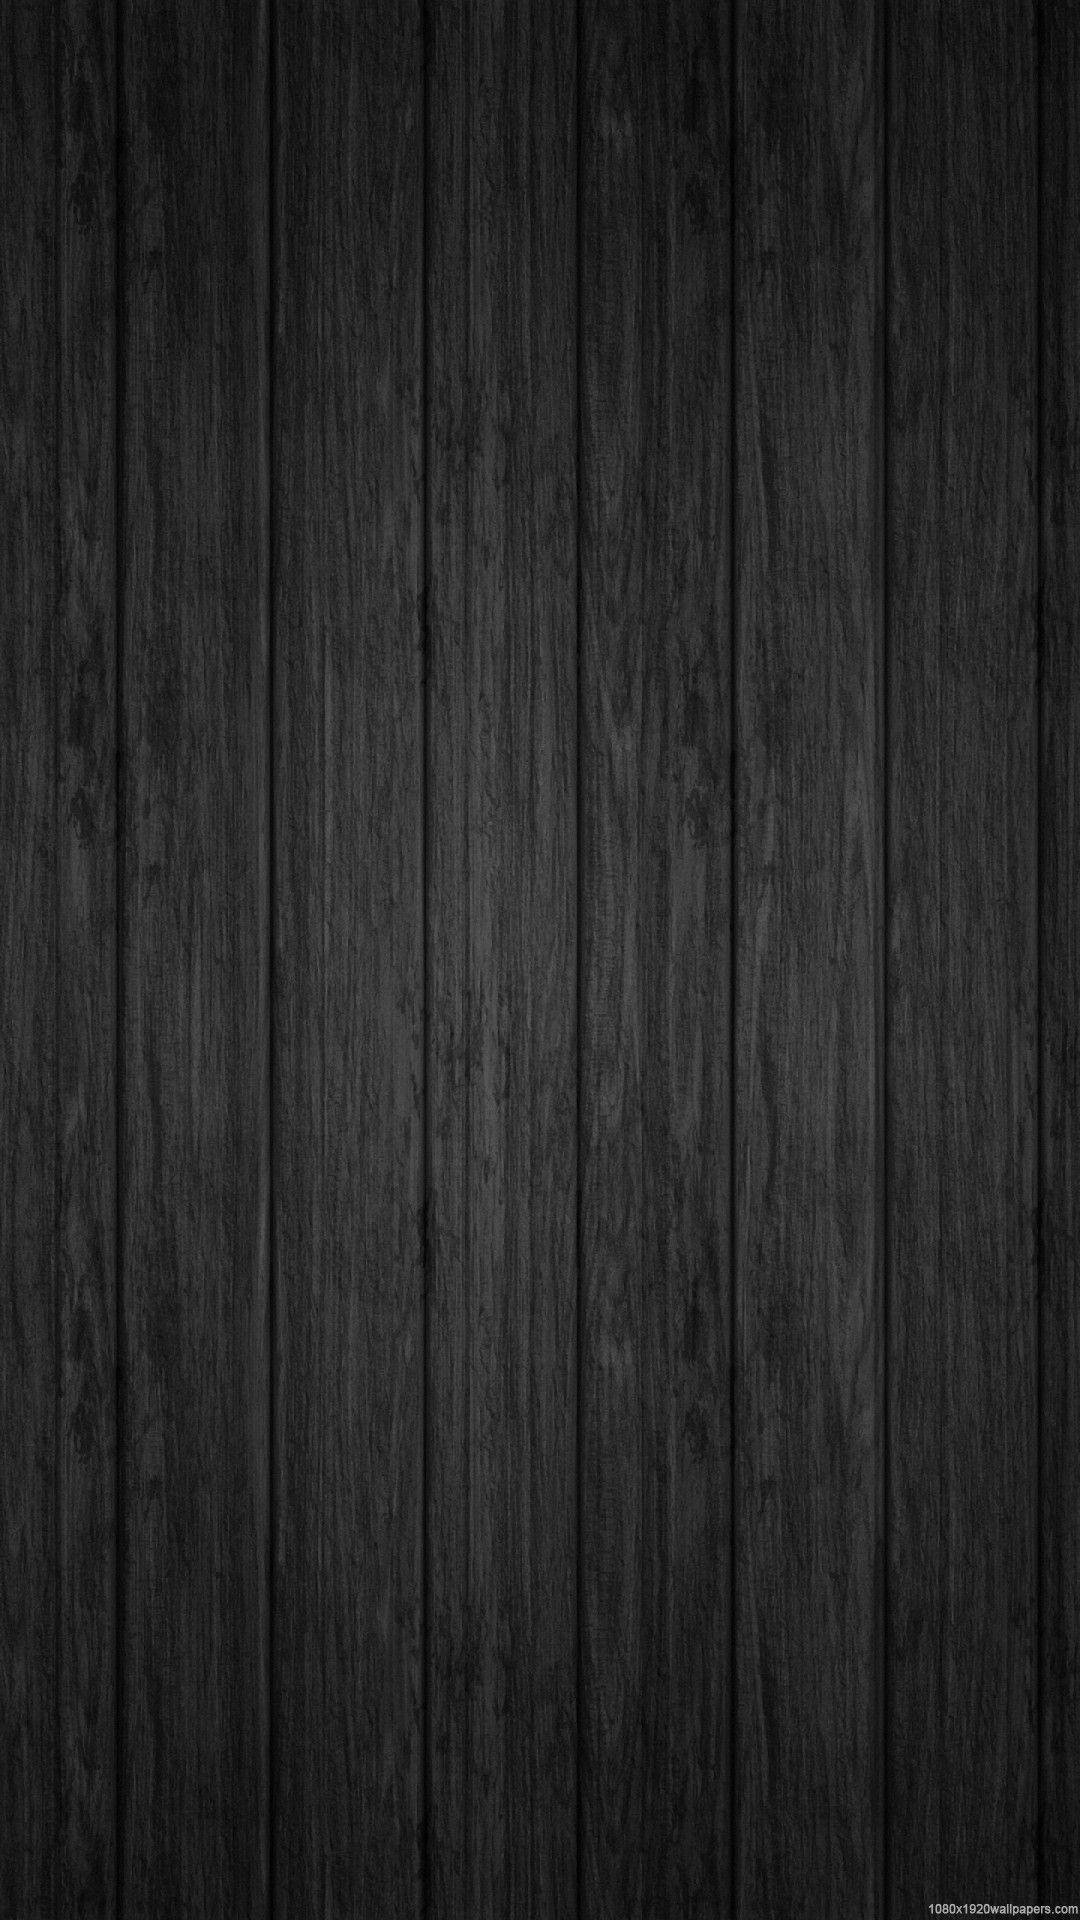 Hd Wood Grain Wallpaper In 2021 Wood Grain Wallpaper Black Wood Background Wood Background